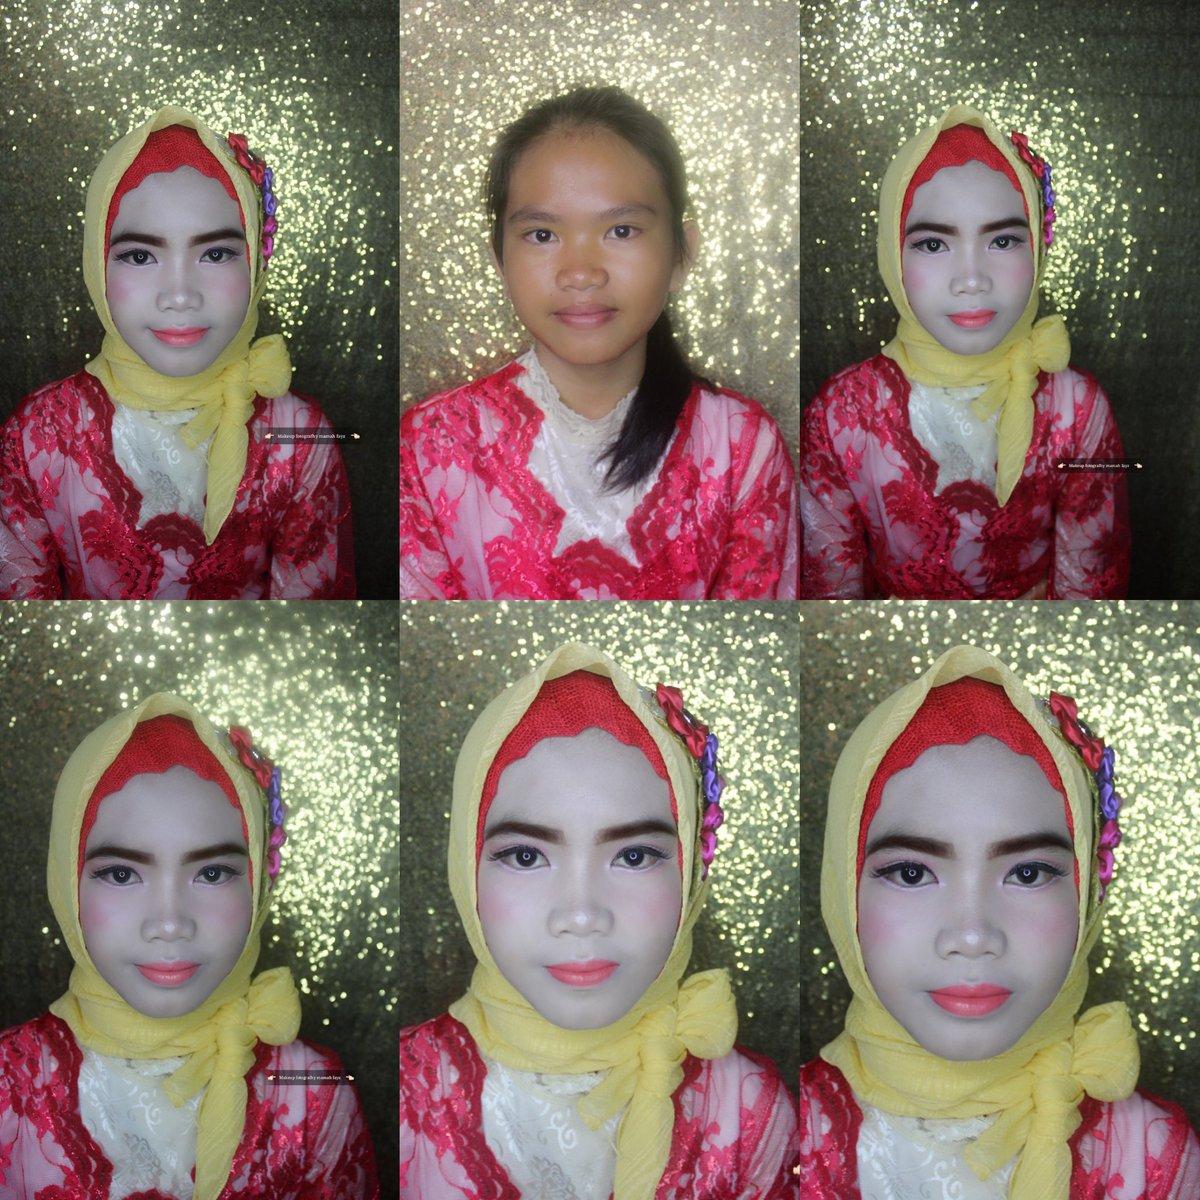 Makeup fotografhy mamah fayz 💄💄#prewedding #riaspengantinlamandau #riaslamandau #riaspengantin #riaspesta #riasfashion #riasfashionshow #riaskondangan #riasperpisahan #hijabmoderen #hijabpengantin #hijabmuslimah #hijabfashion #hijabpesta #lamandau #nangabulik #kalteng https://t.co/uYuptS2nxd